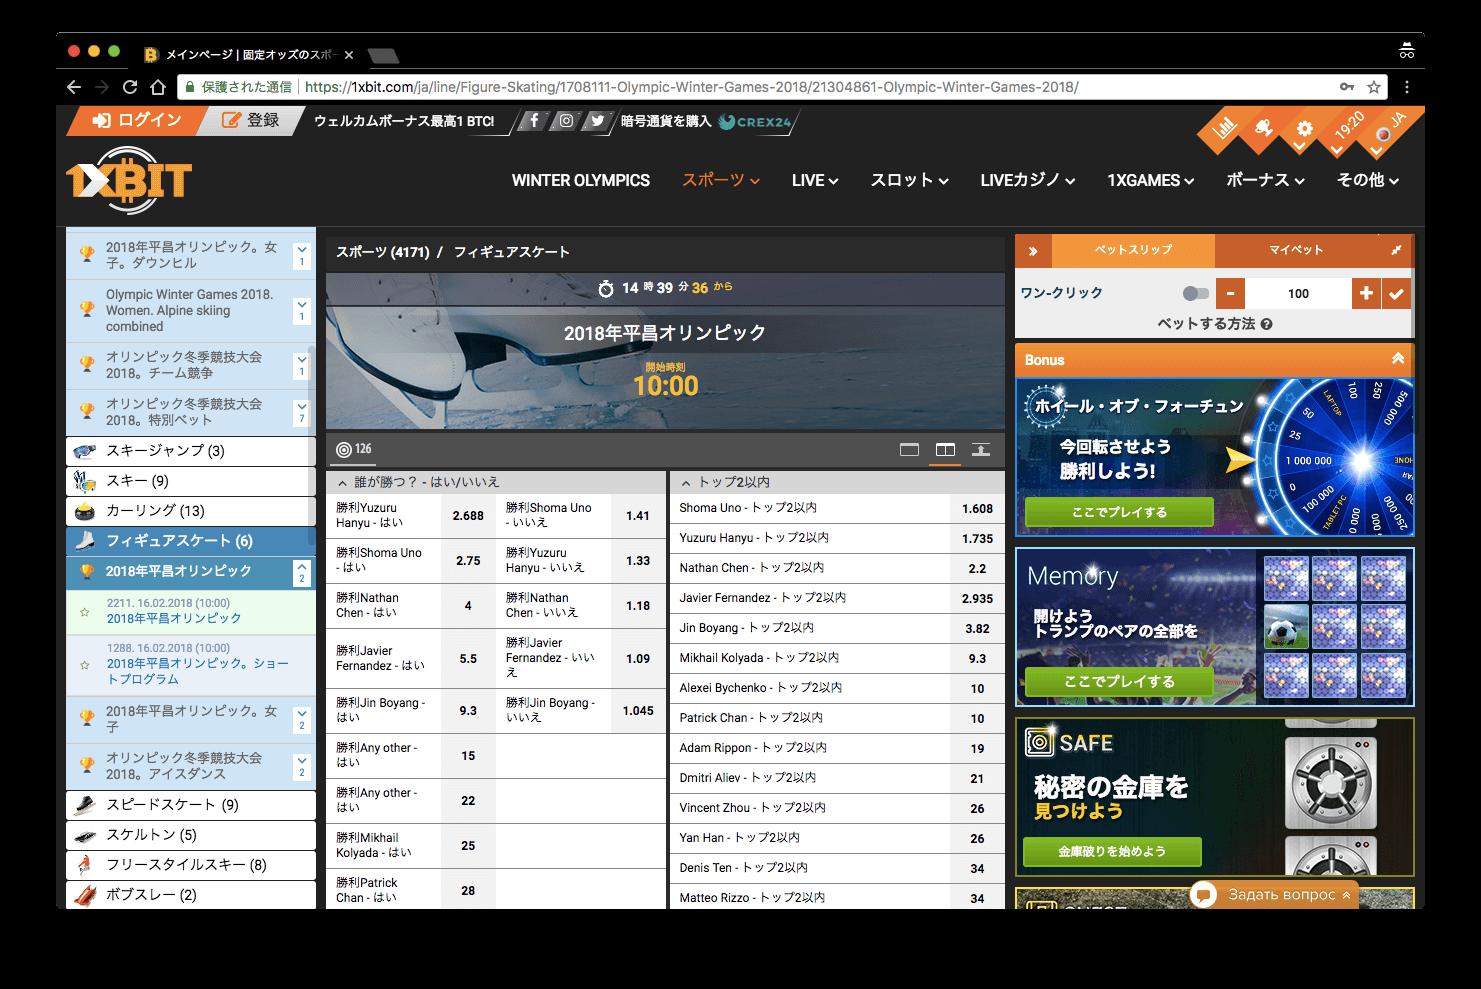 1xBITで平昌冬季オリンピックフィギュアスケートの予想画面